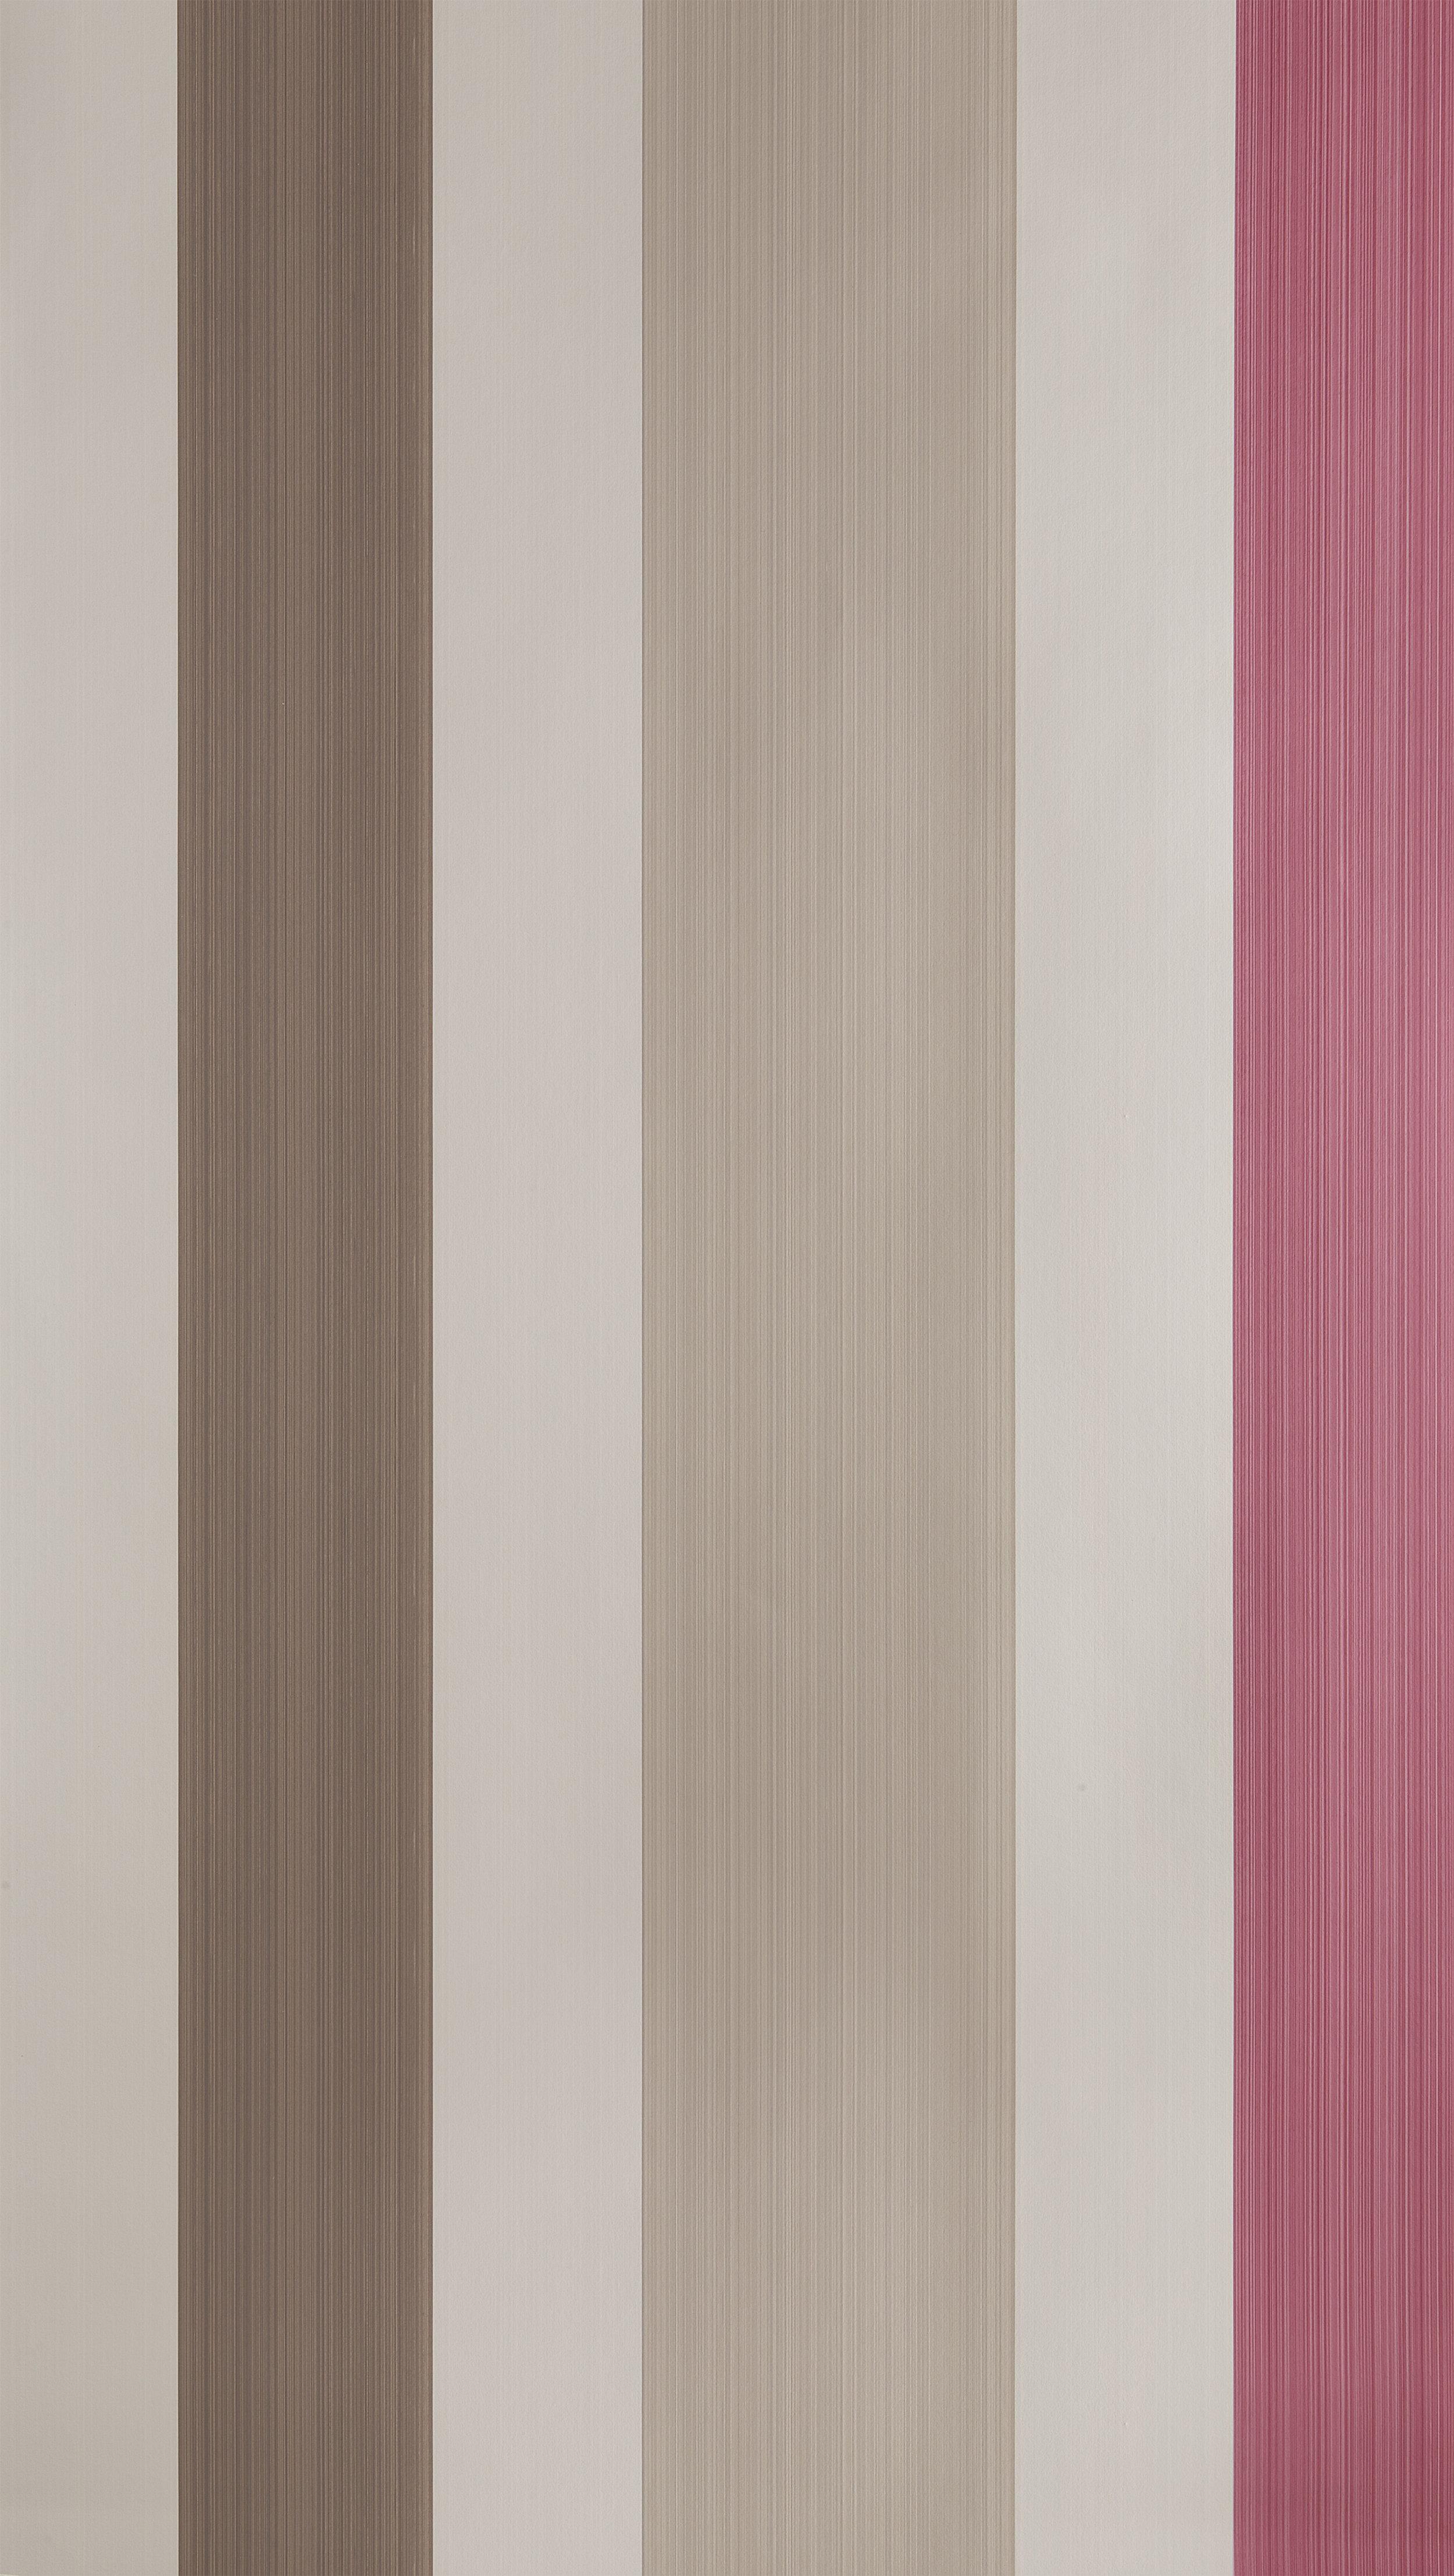 Chromatic Stripe 4204 $195 Per Roll  Order Now